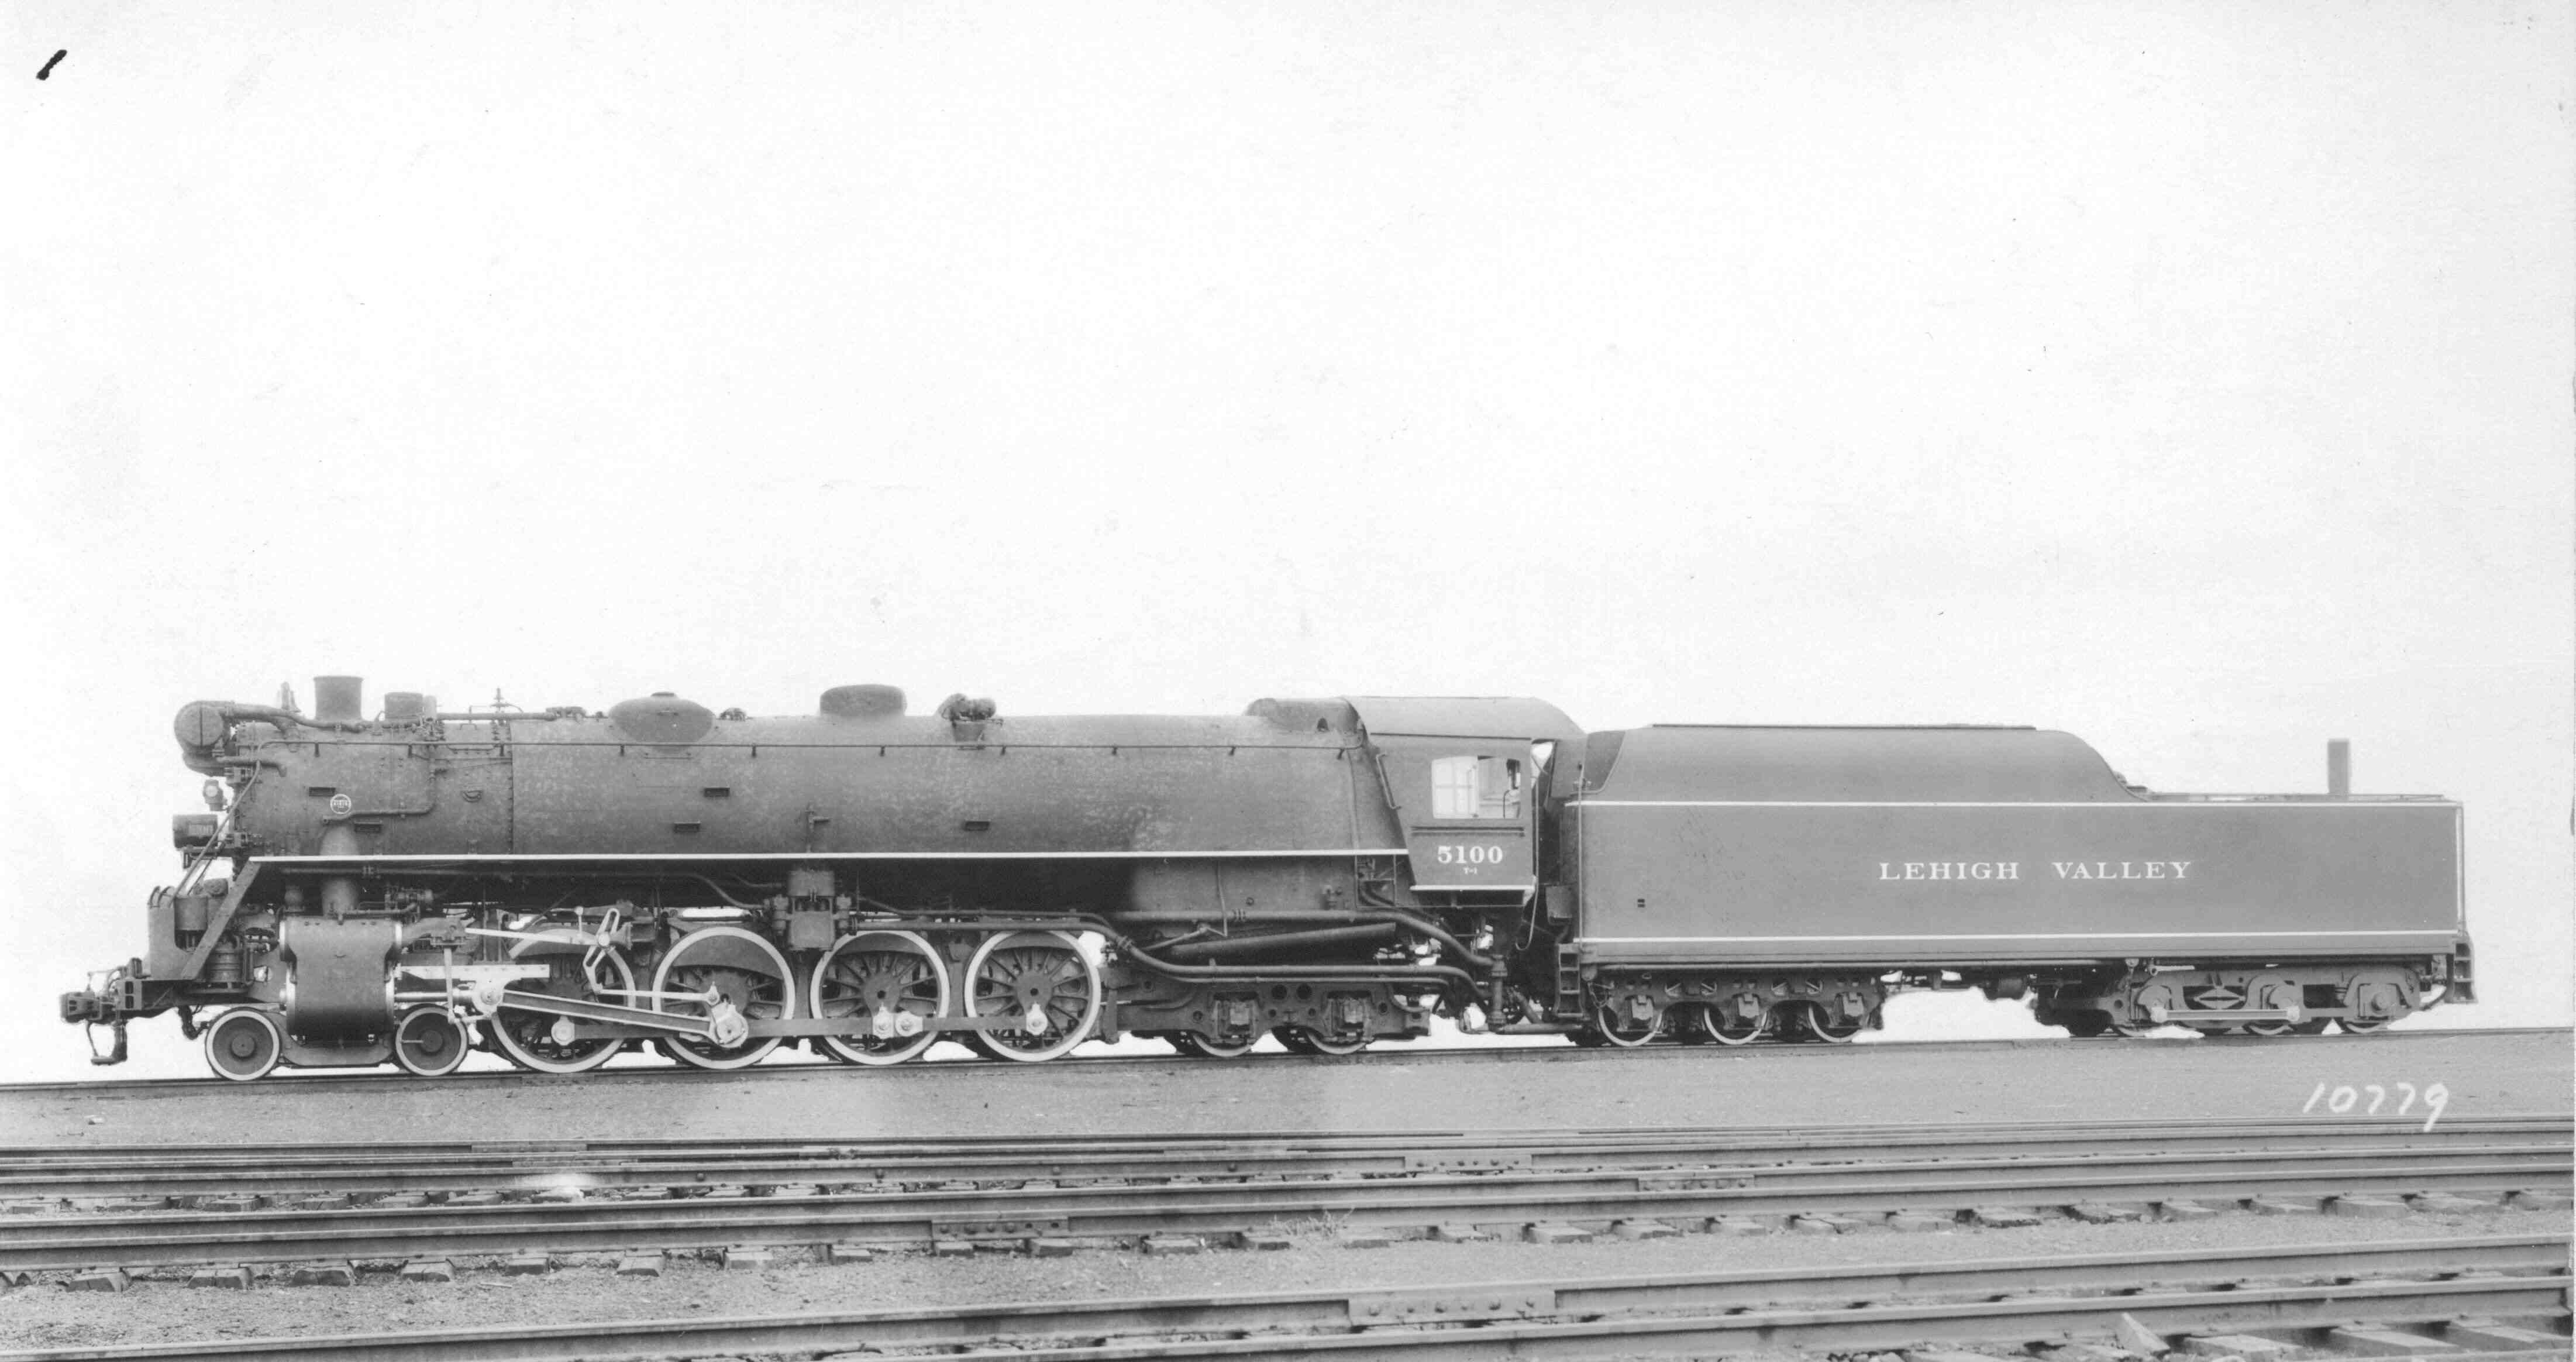 LV 5100